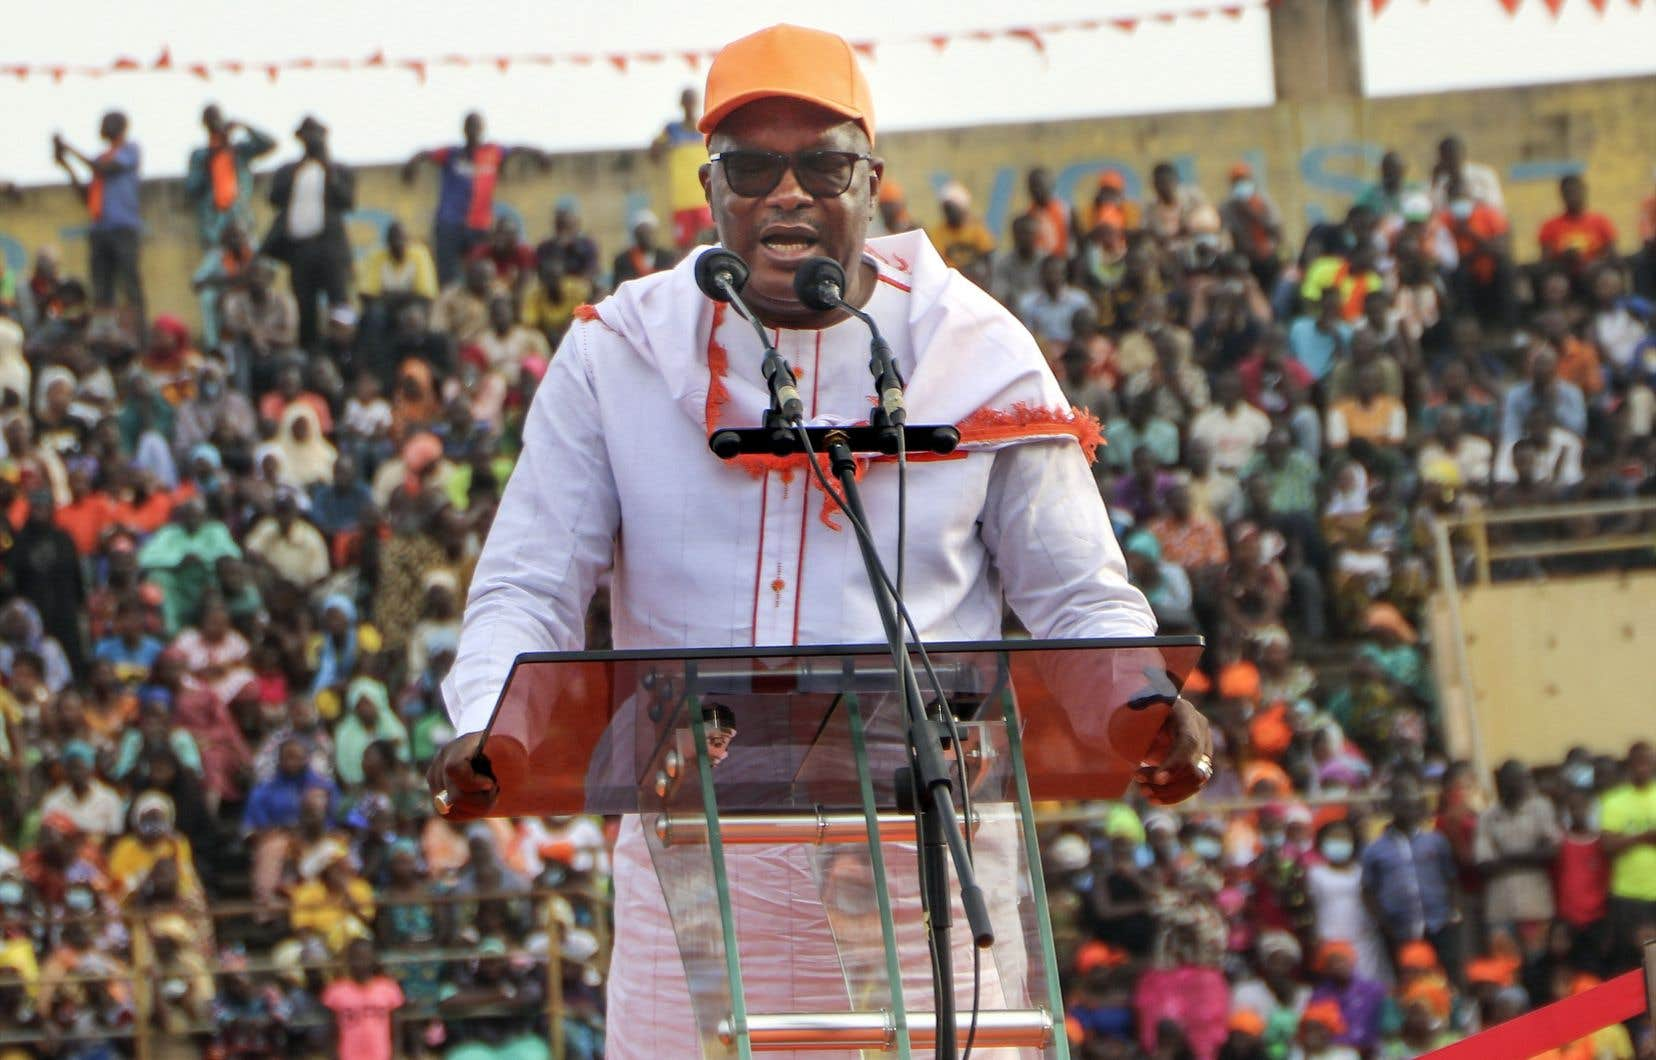 Le président du Burkina Faso,Roch Marc Christian Kaboré